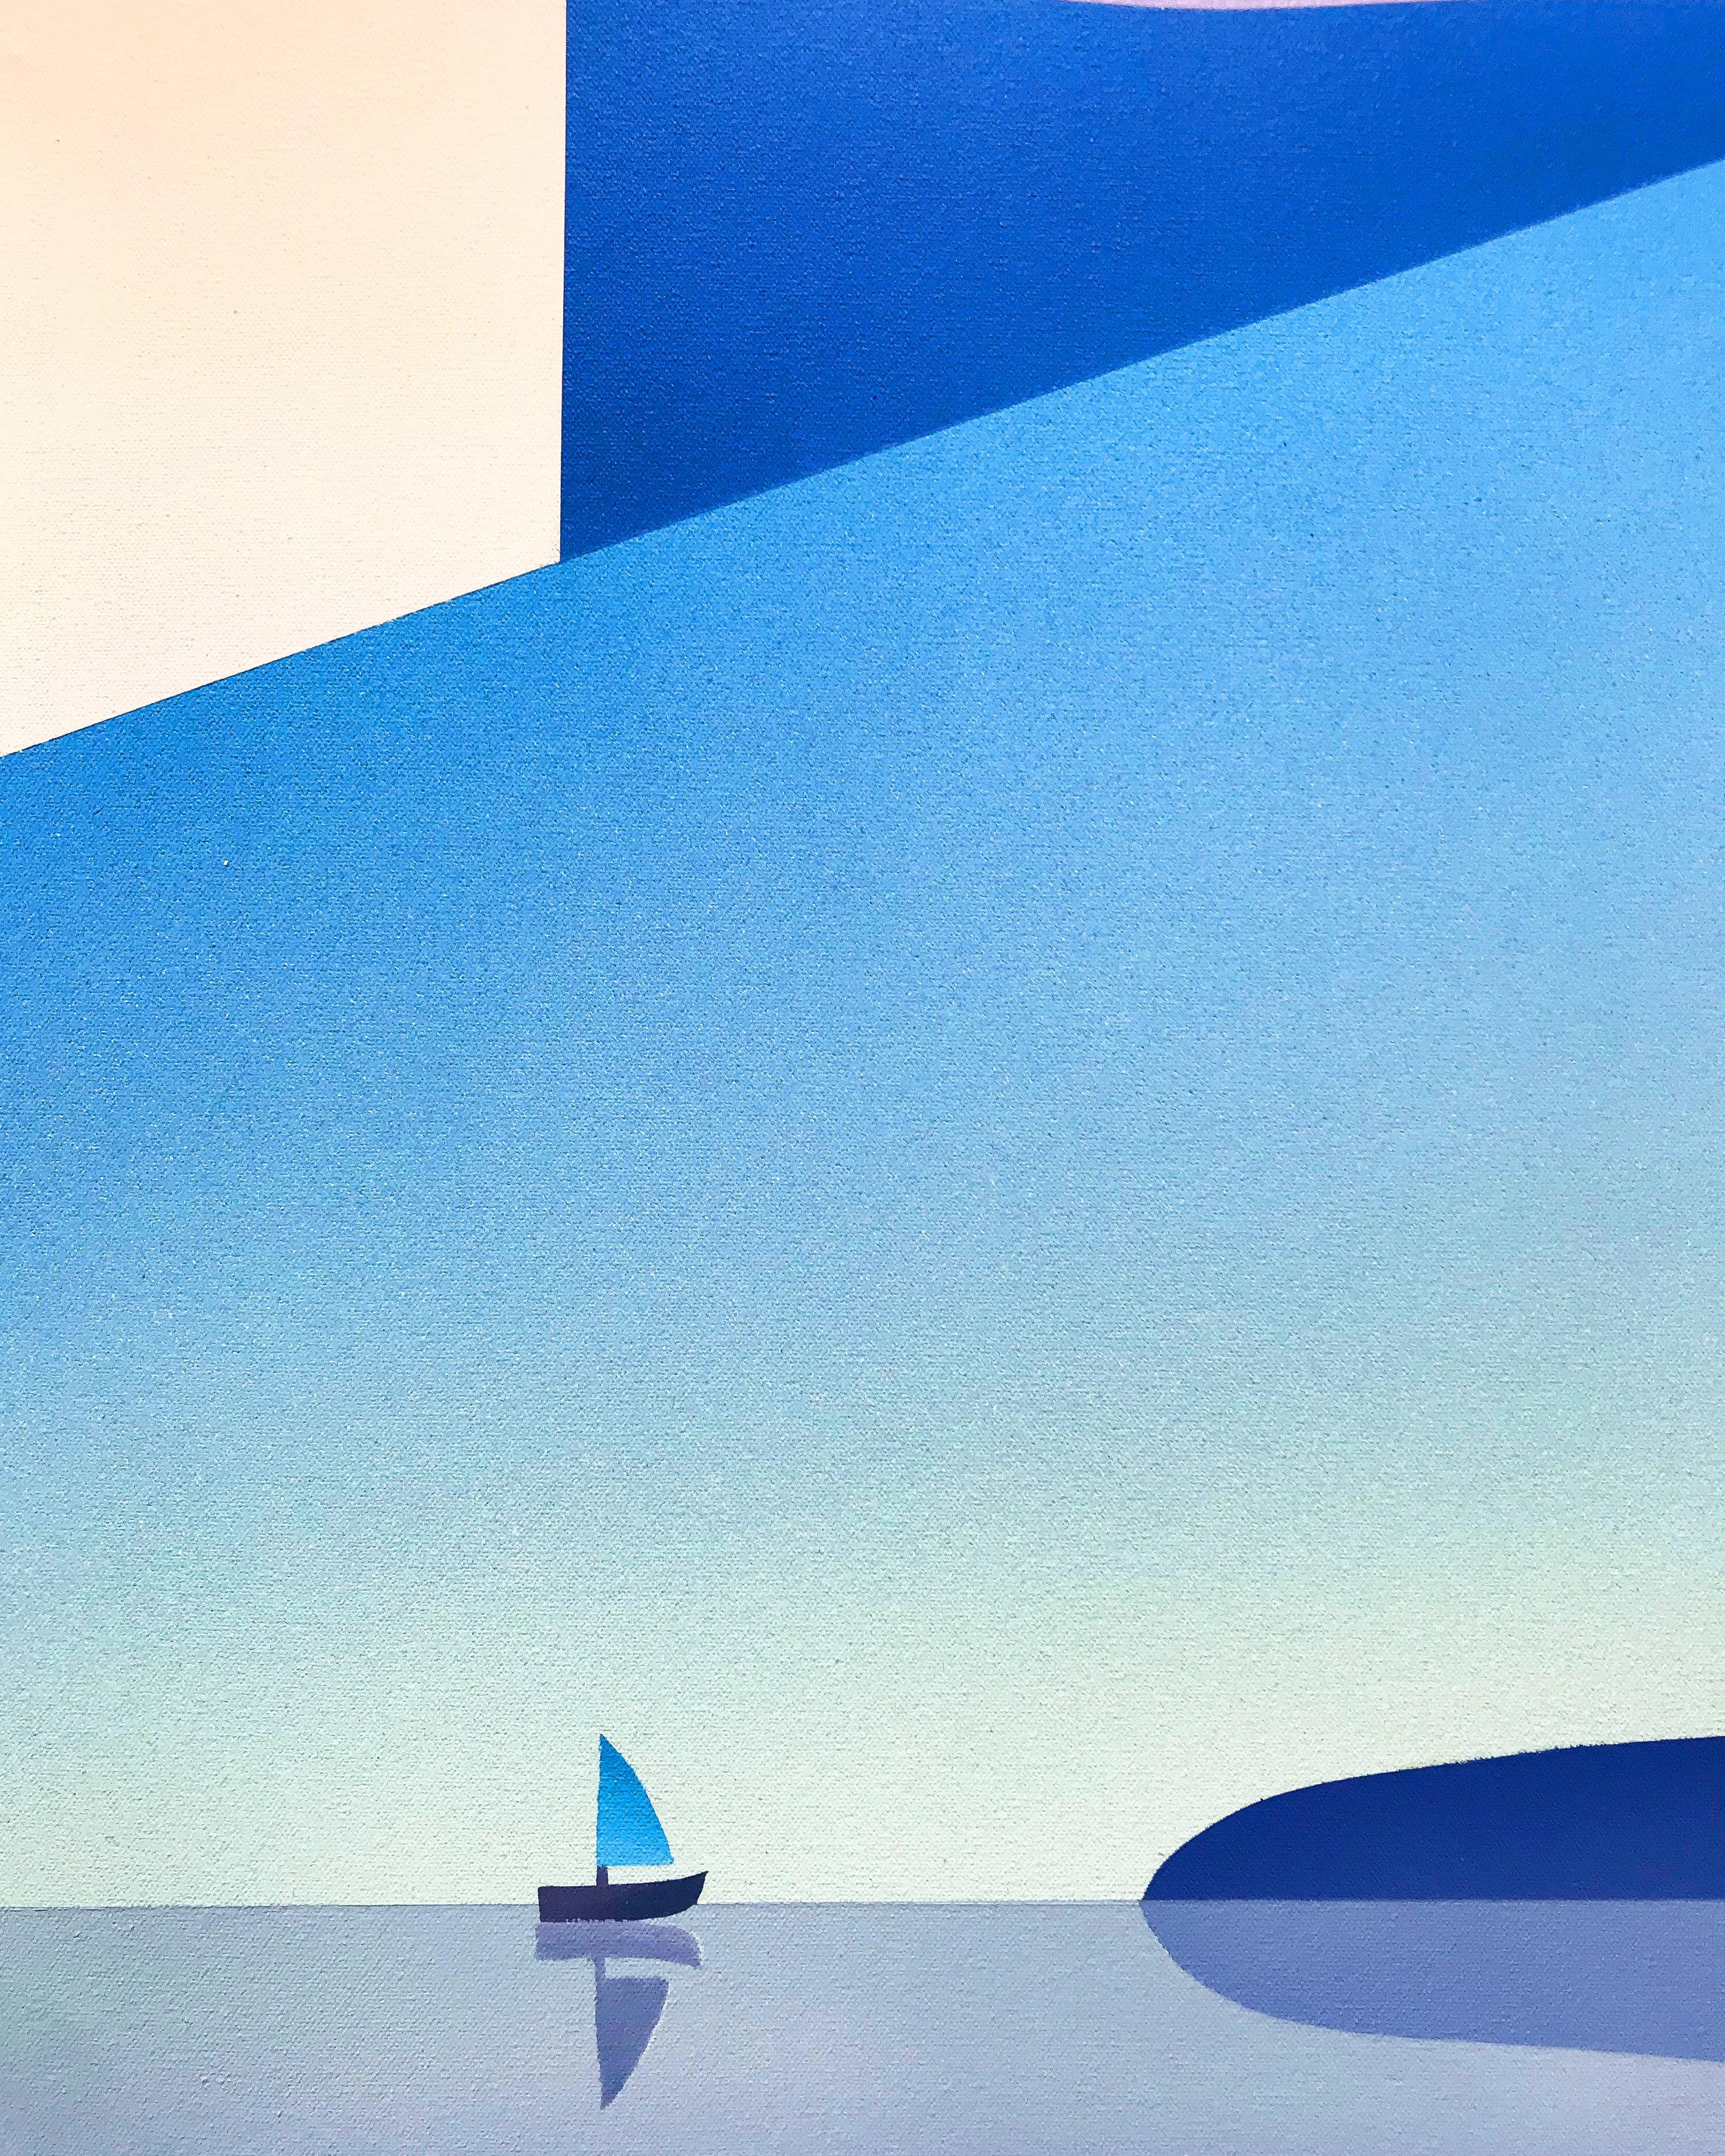 boatcloud_1.jpg